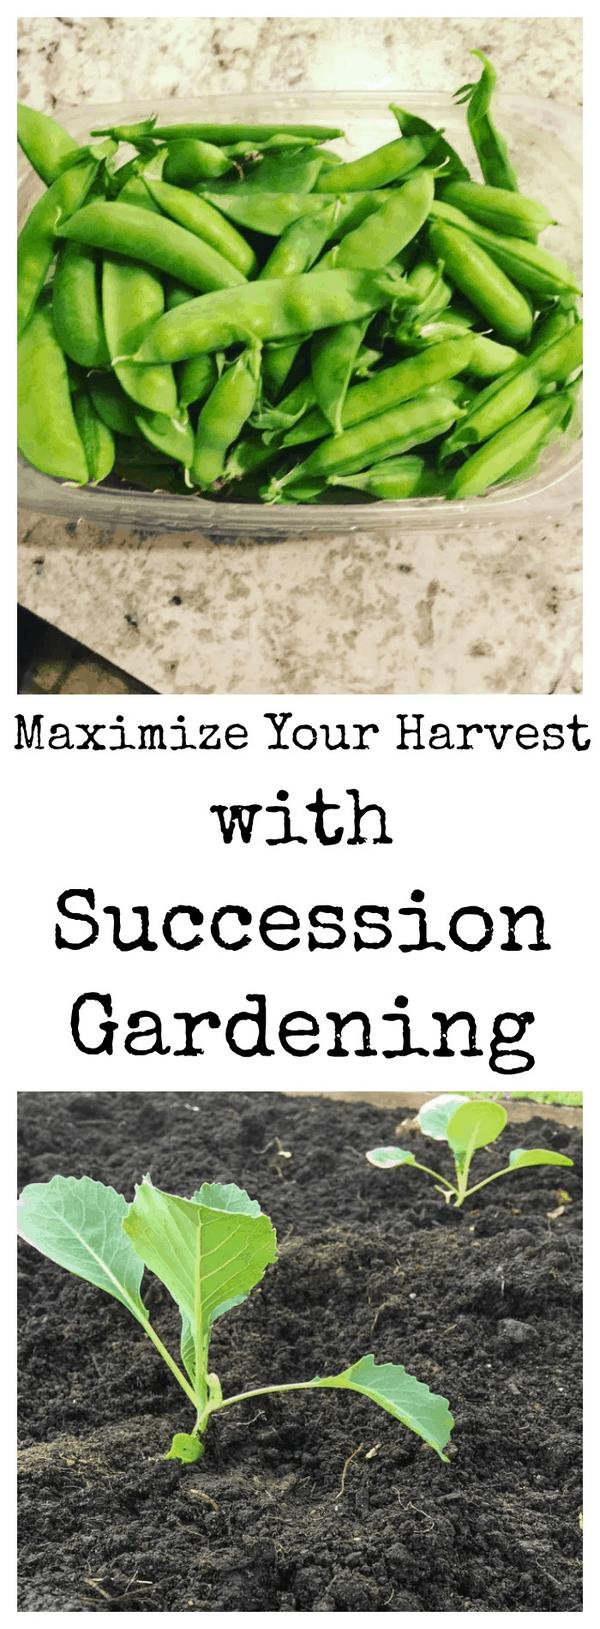 Succession Gardening